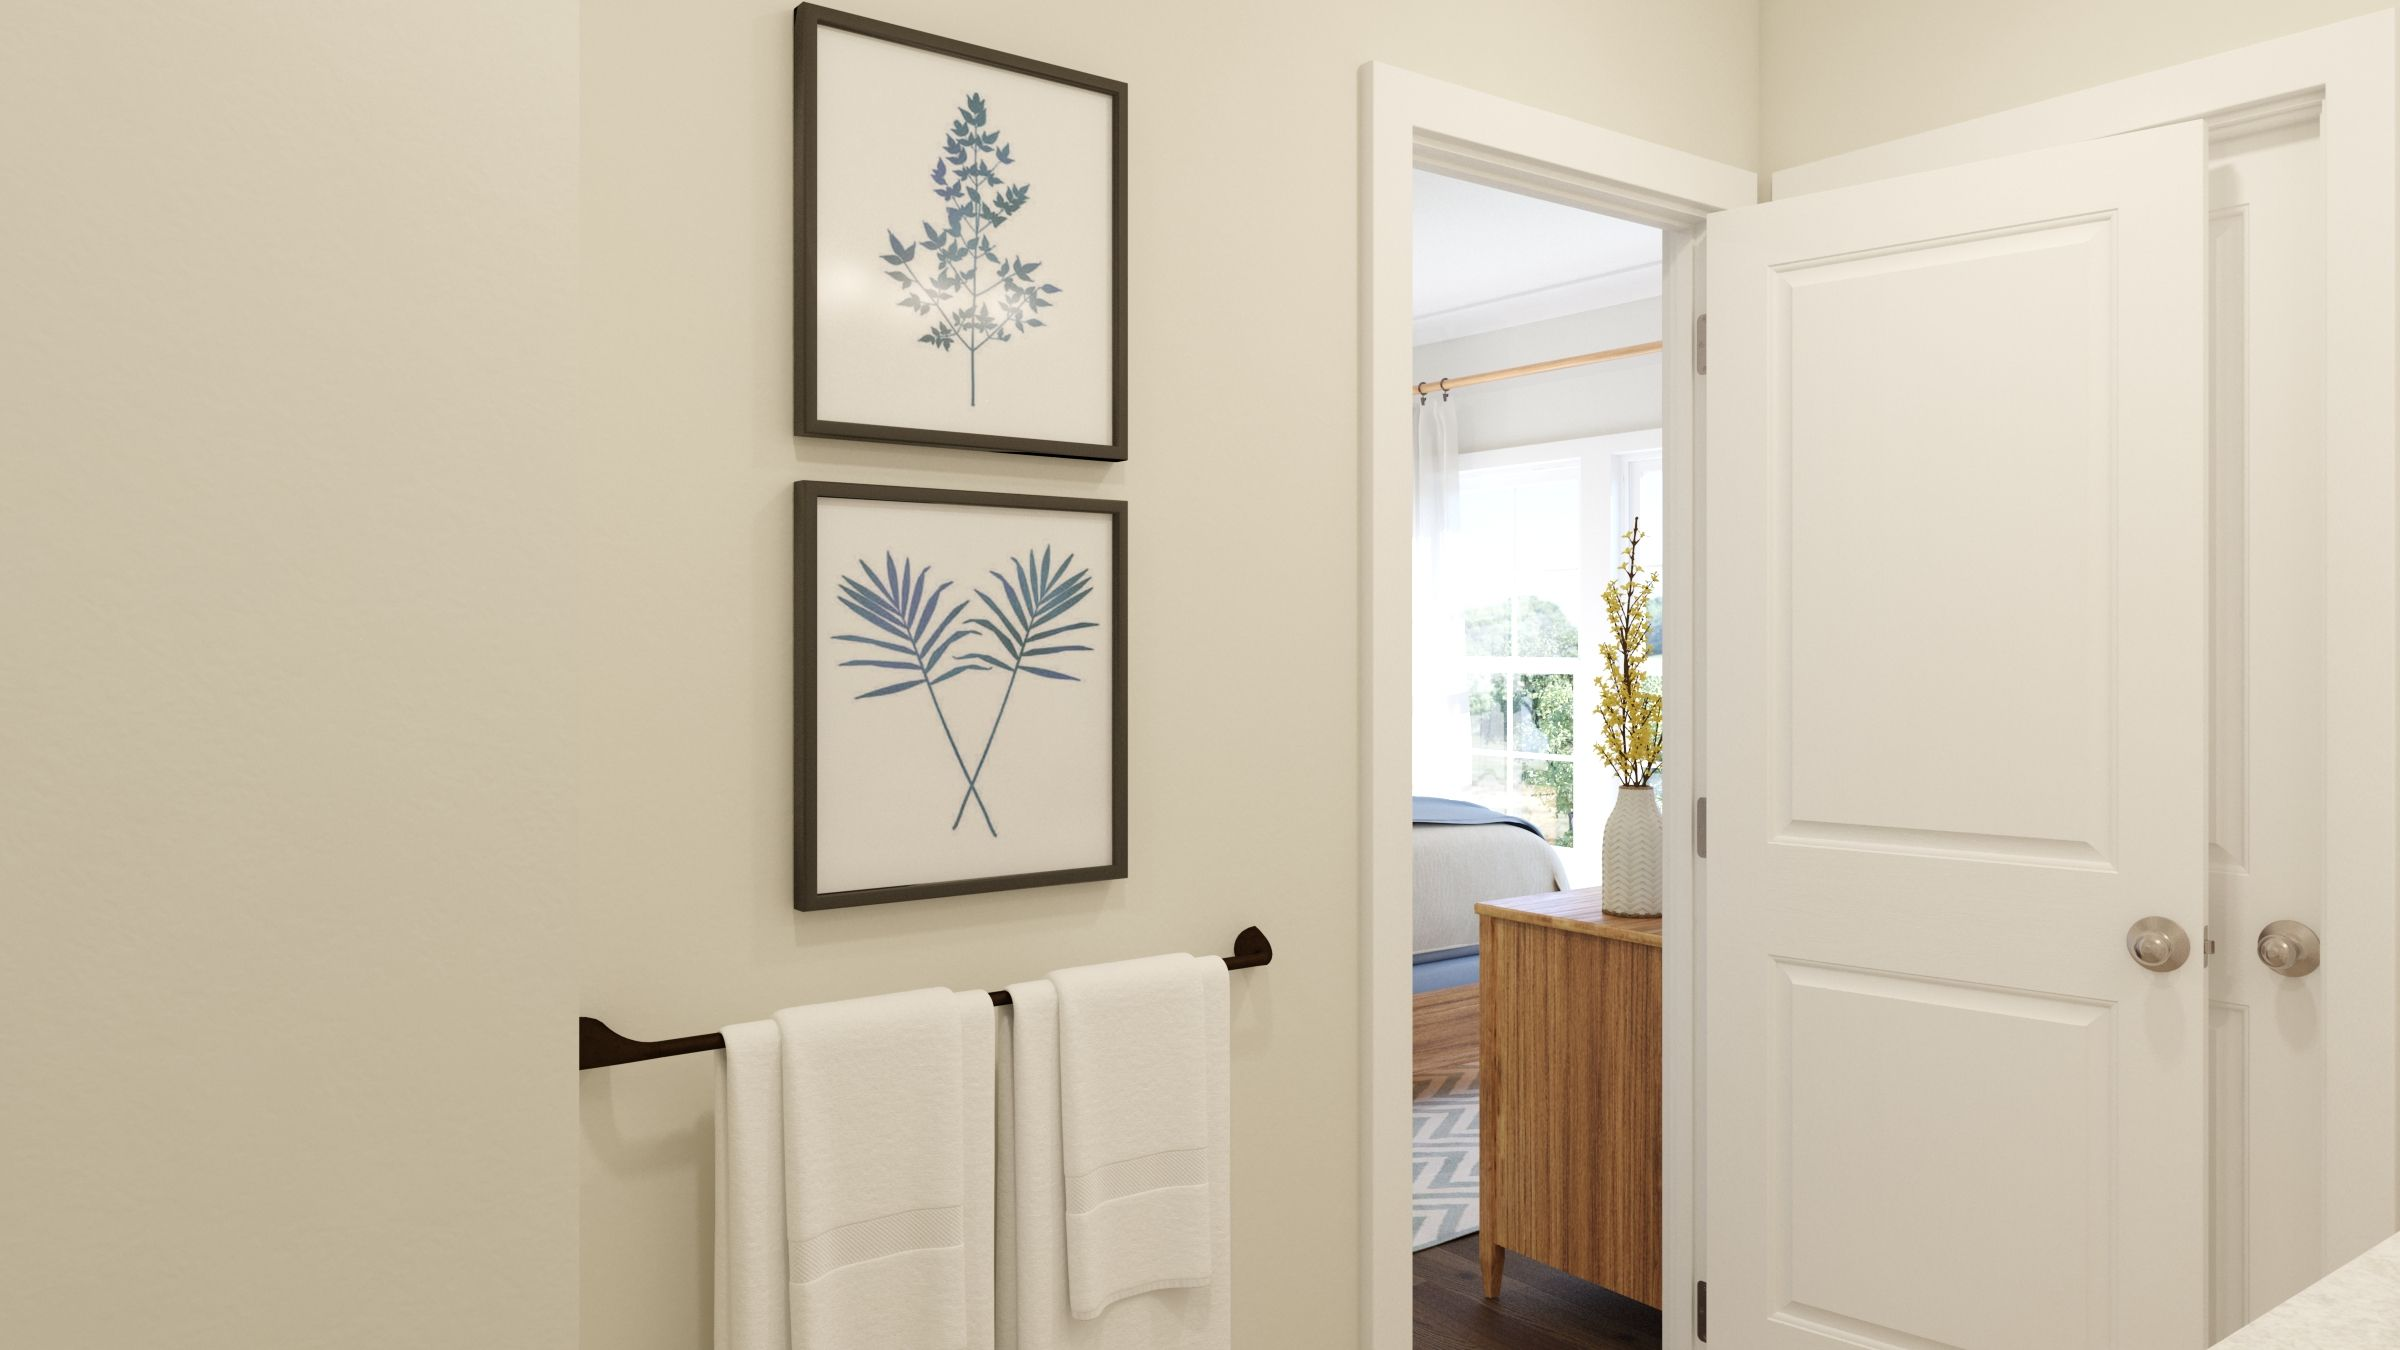 Bathroom featured in the Tiegan By Van Metre Homes in Washington, VA